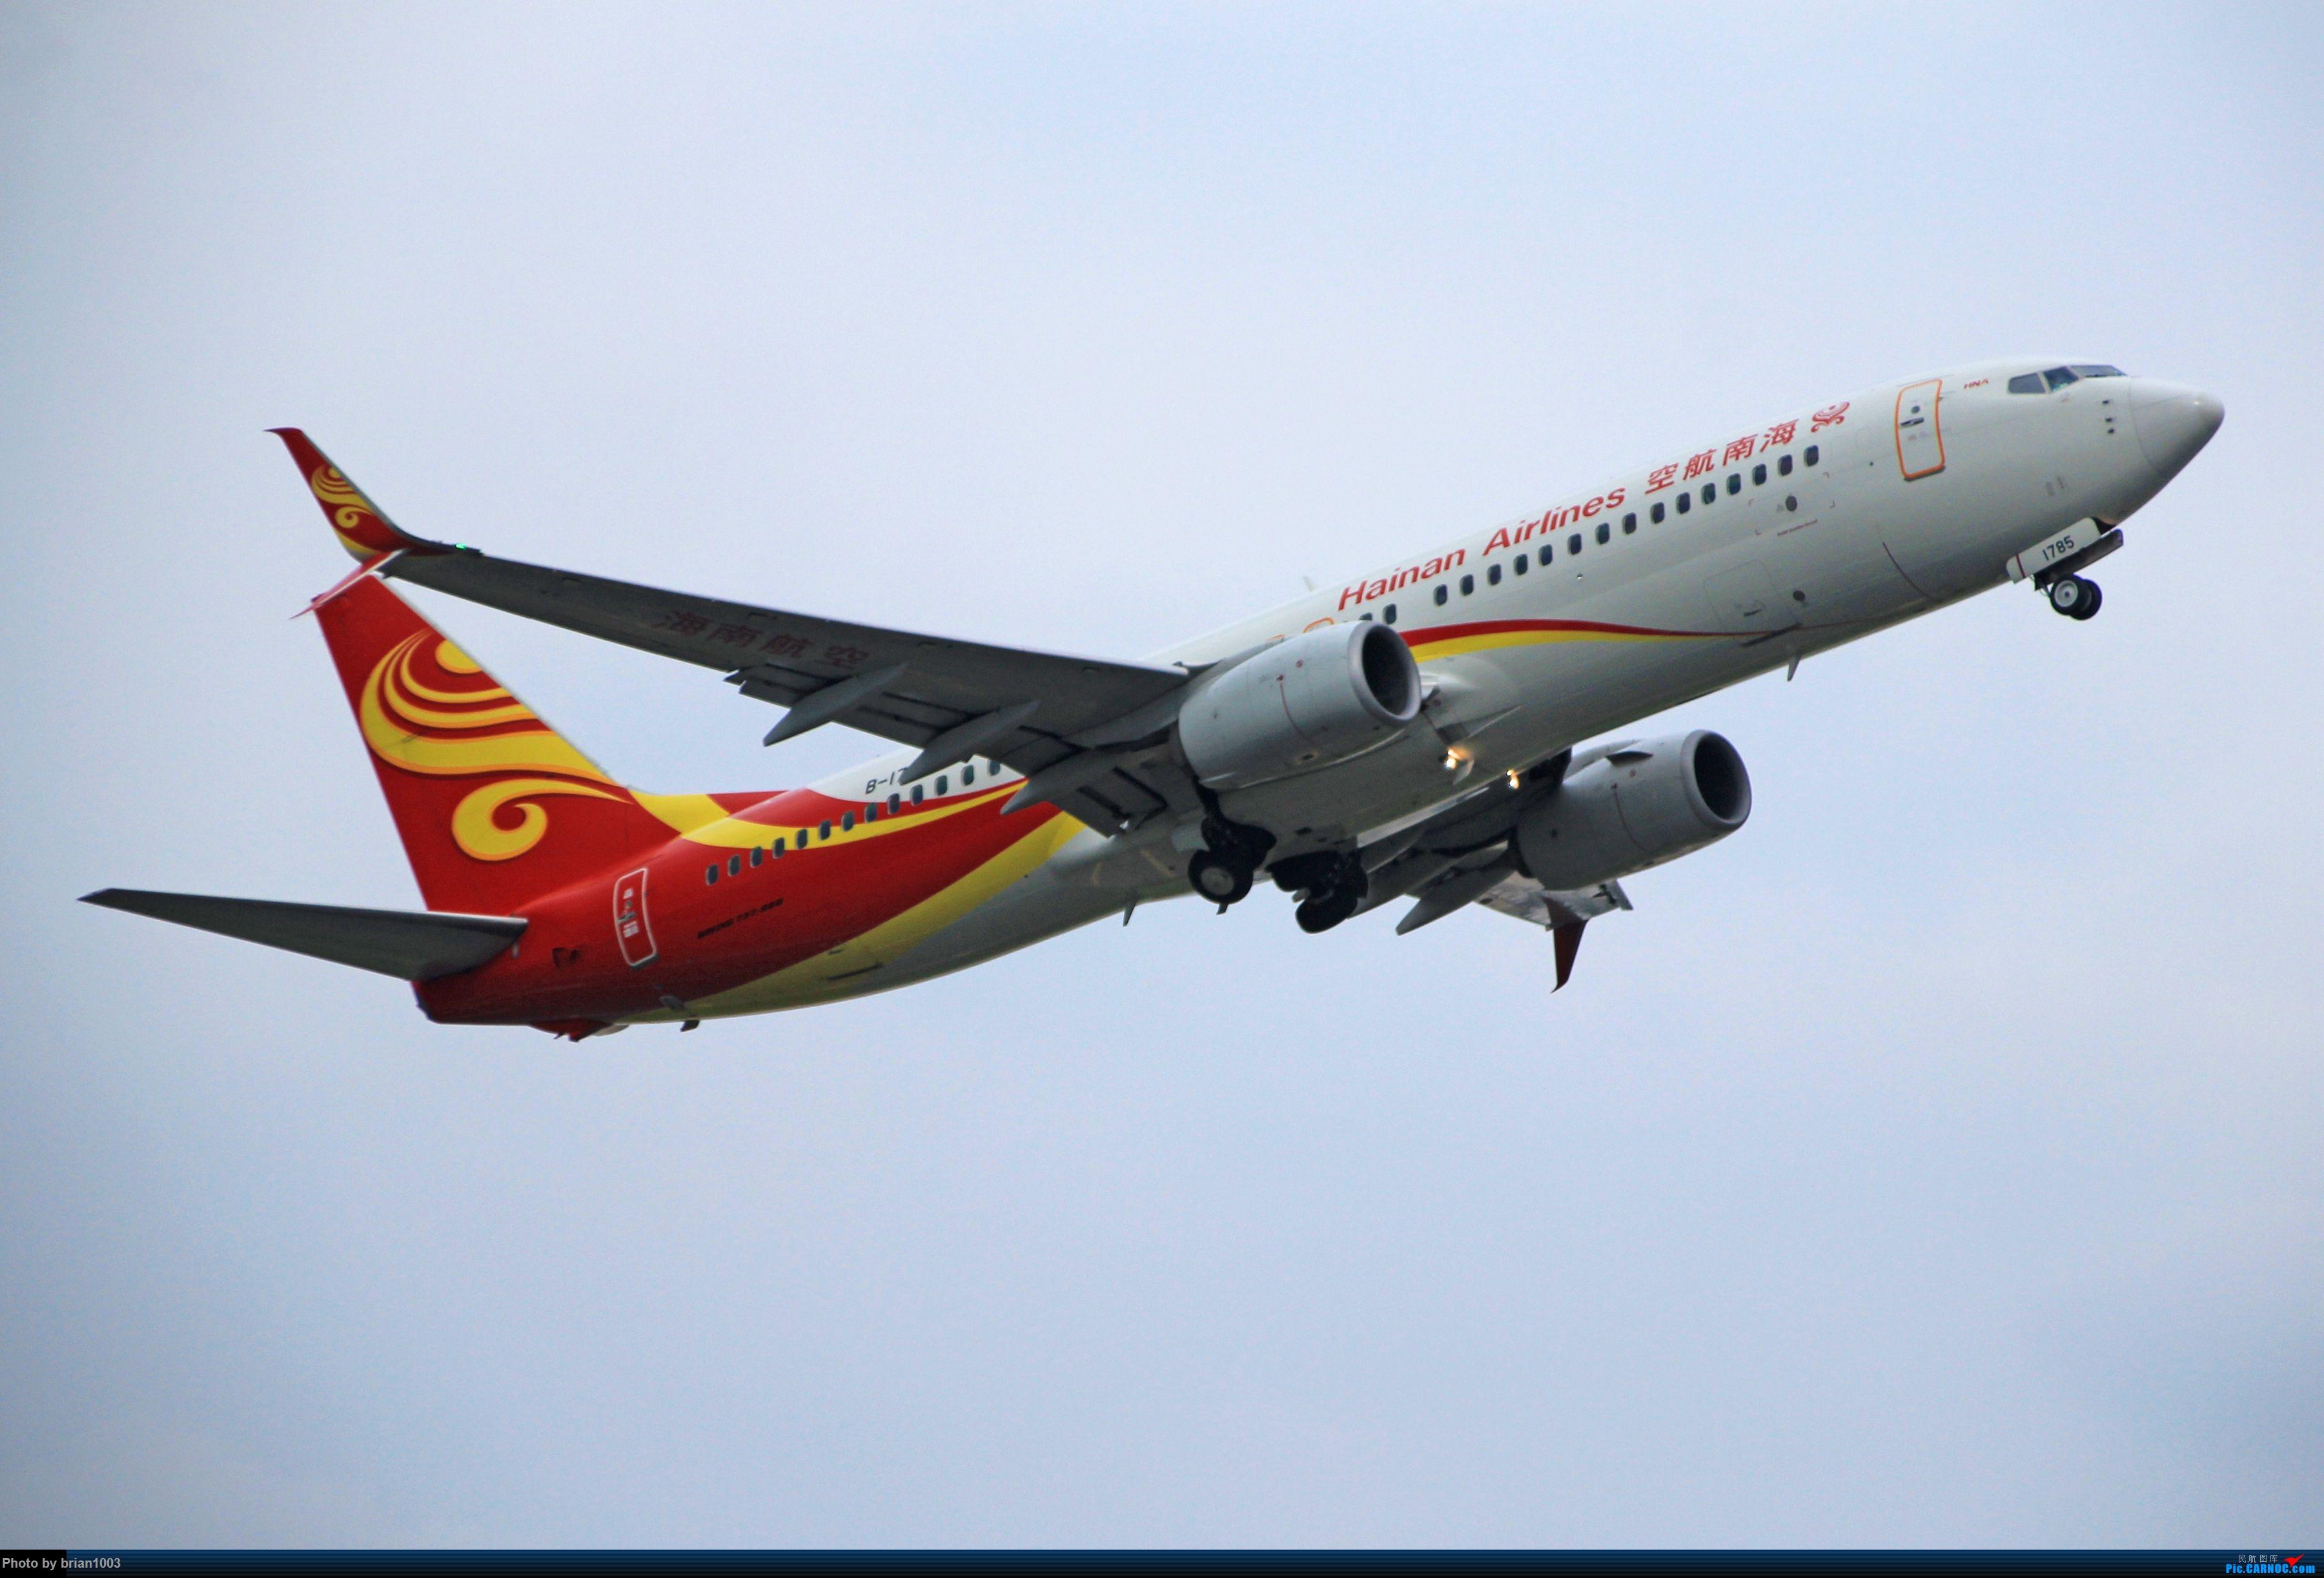 Re:[原创]WUH天河机场拍机之六月还有啥(X7家744F、天津大韩港龙333、巴基斯坦772、B6419、ER-BBJ 74F、某菊塞斯纳、俄航国航77W) BOEING 737-800 B-1785 中国武汉天河国际机场